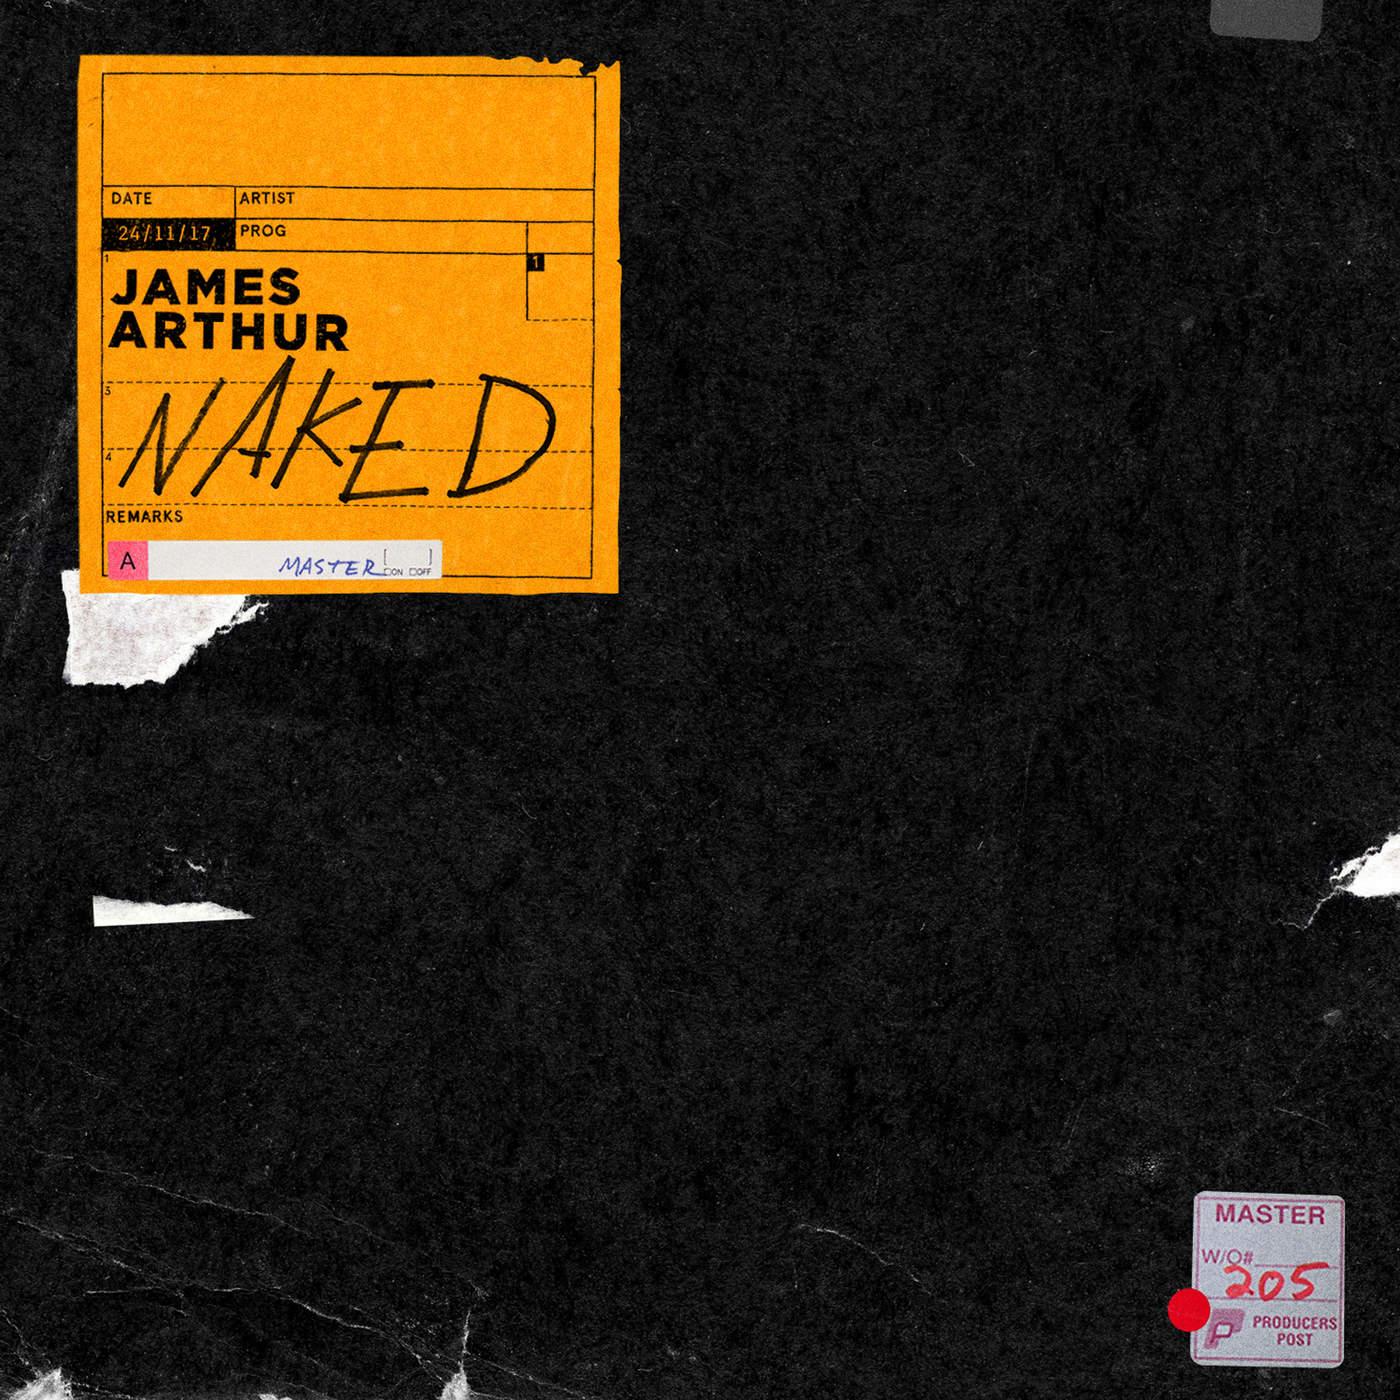 James Arthur - Naked - Single